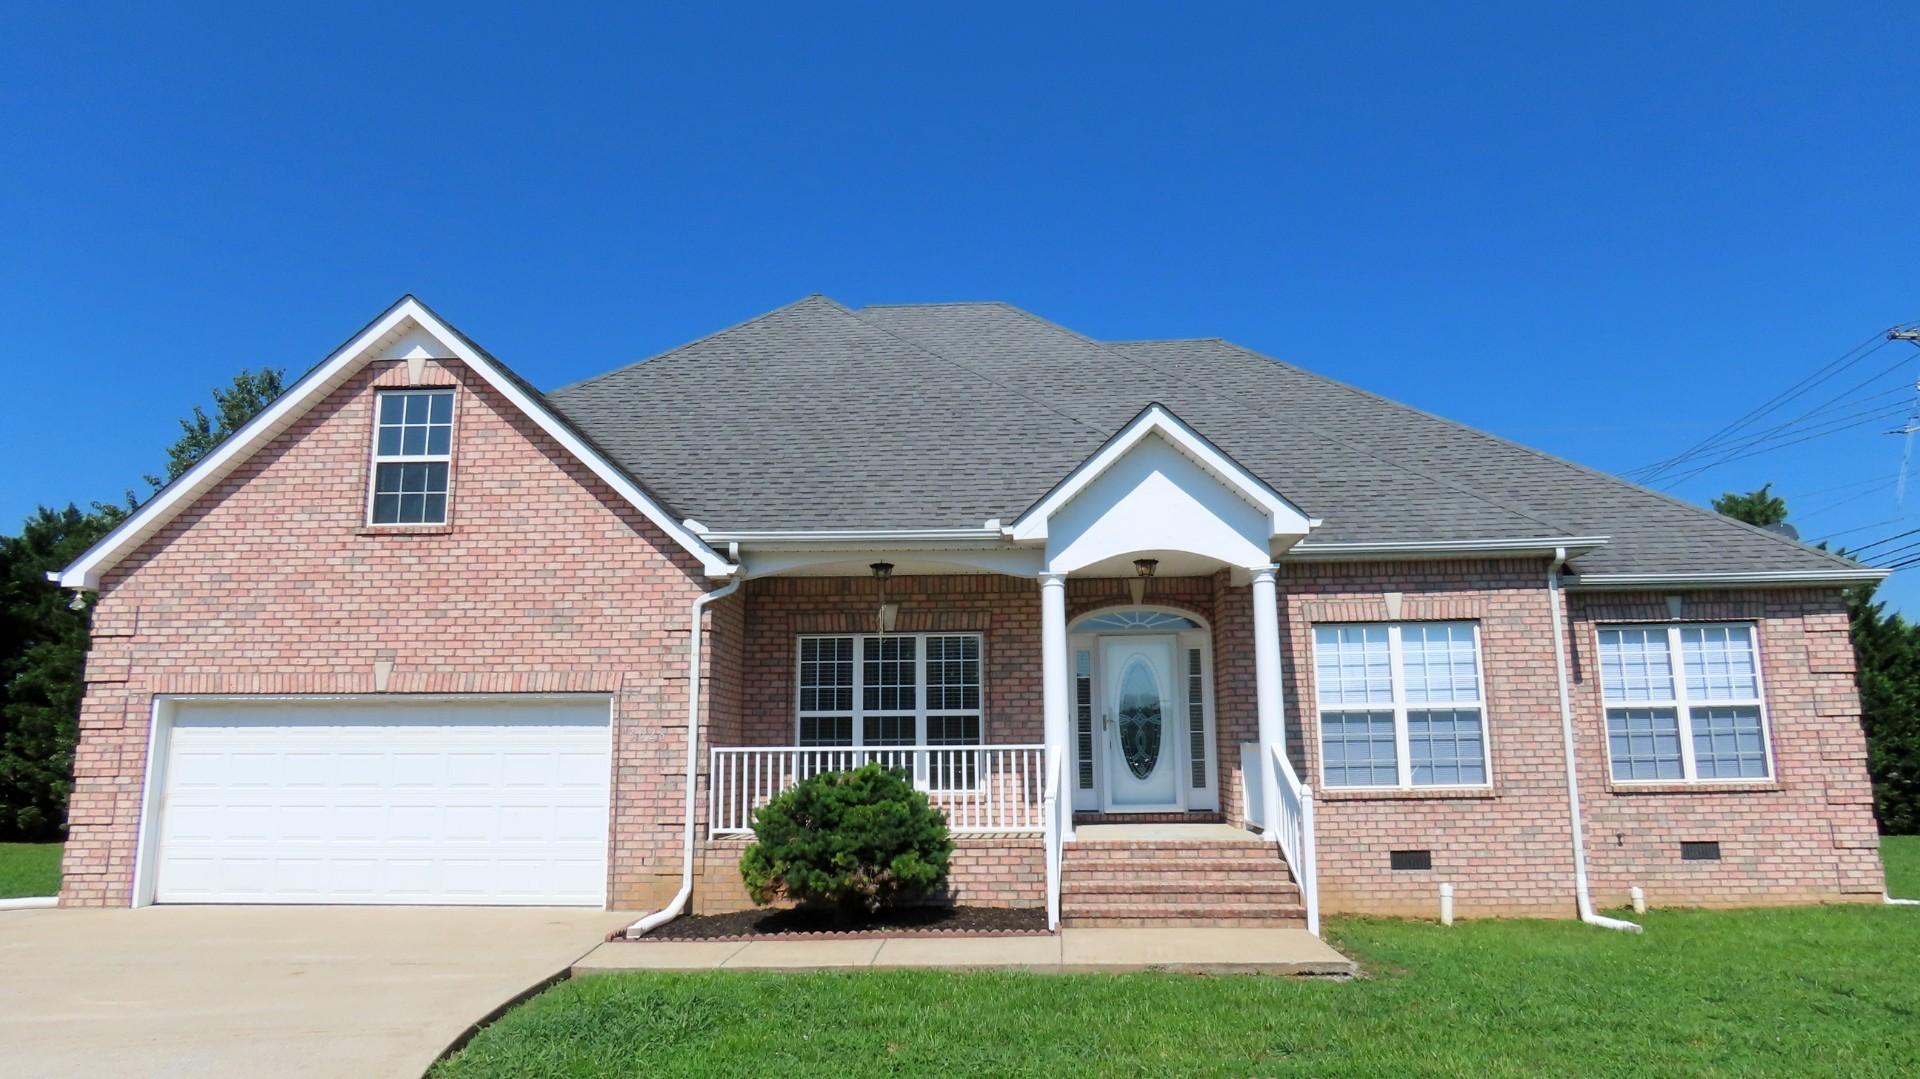 3028 Shady Glen Cir Property Photo - Murfreesboro, TN real estate listing